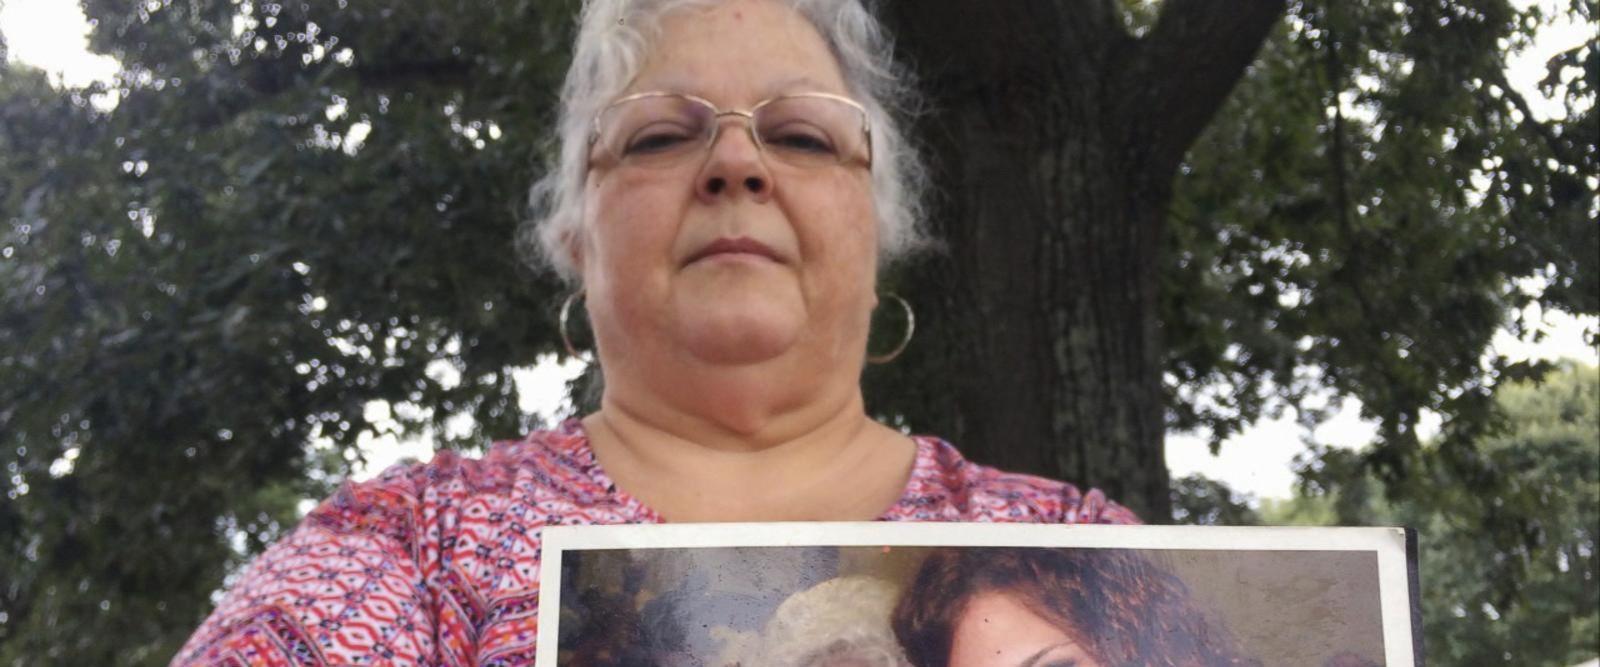 VIDEO: Mother of Heather Heyer 'won't talk to Trump'